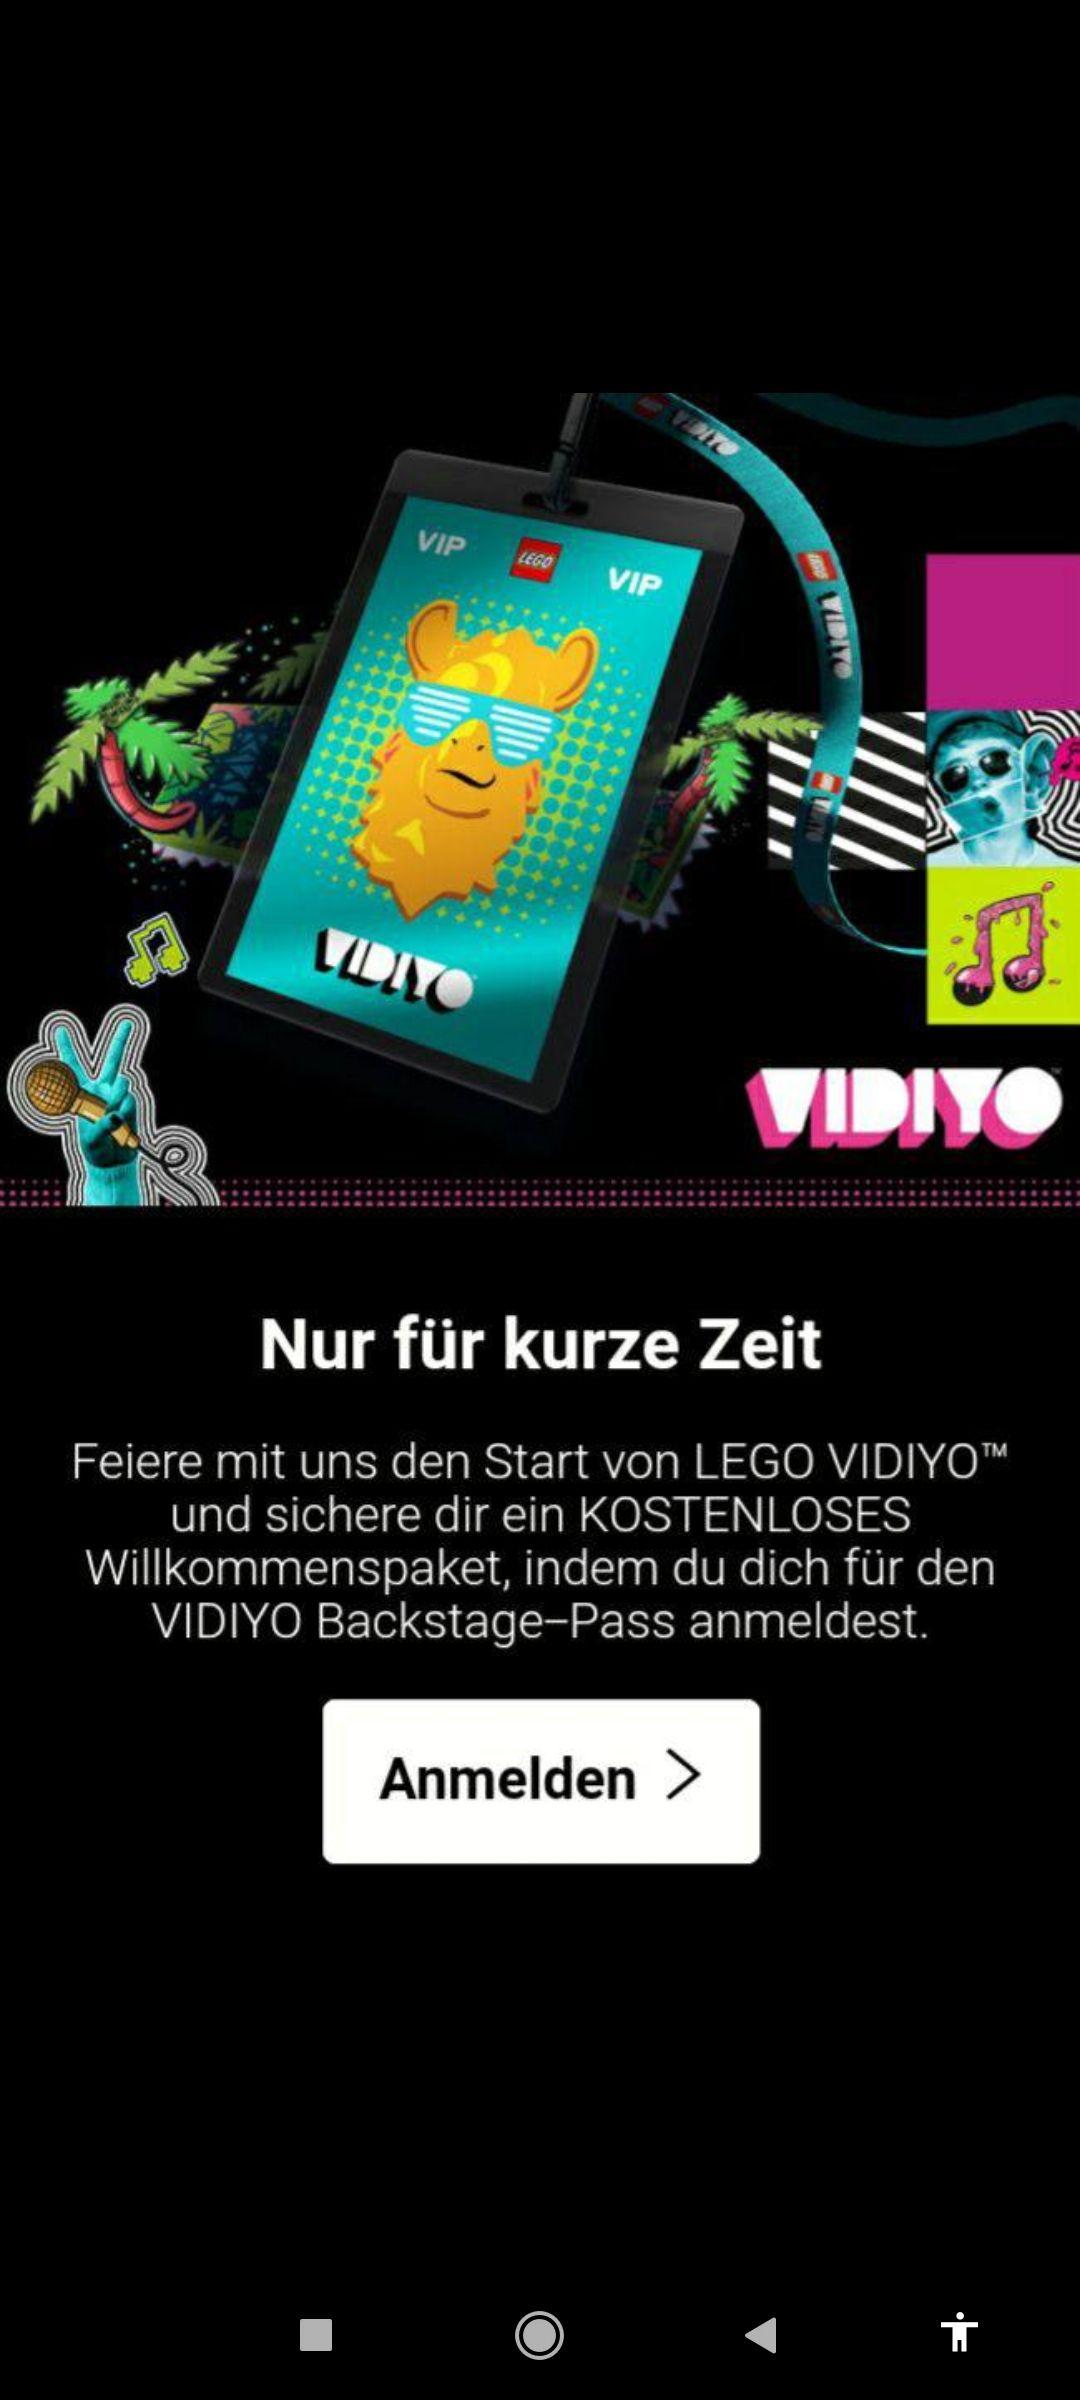 Gratis Lego Vidiyo Wilkommenspaket - personalisiert